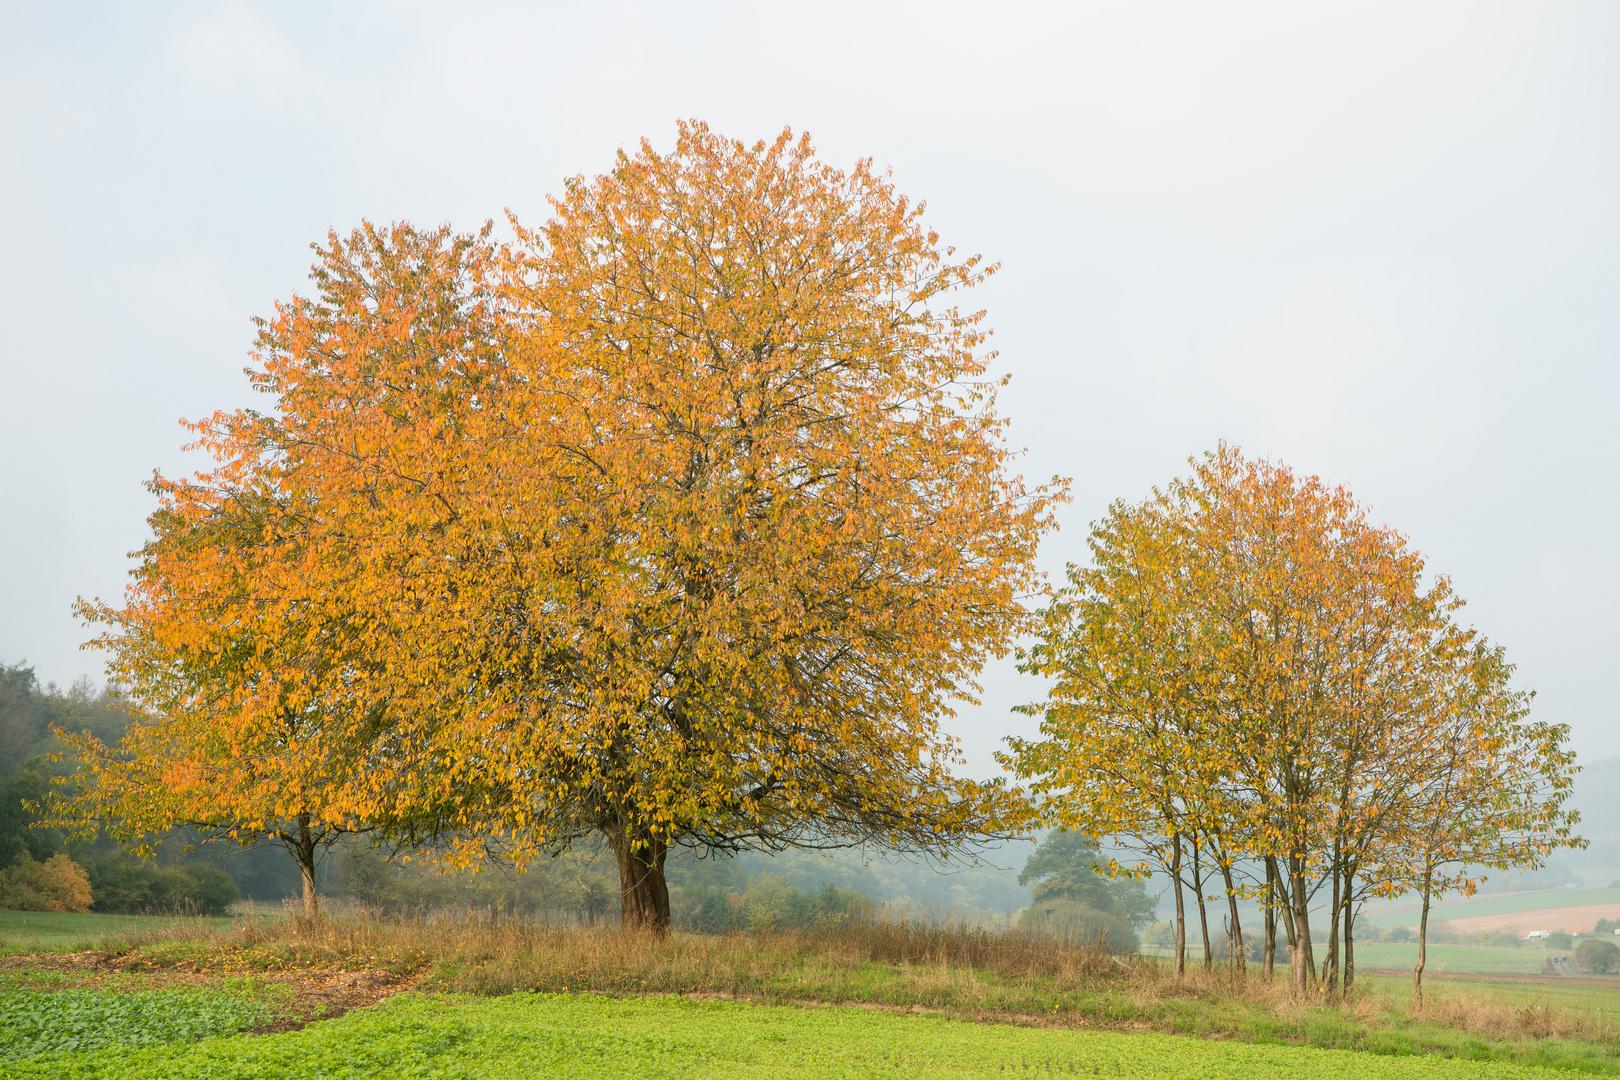 Herbsbaumgruppe